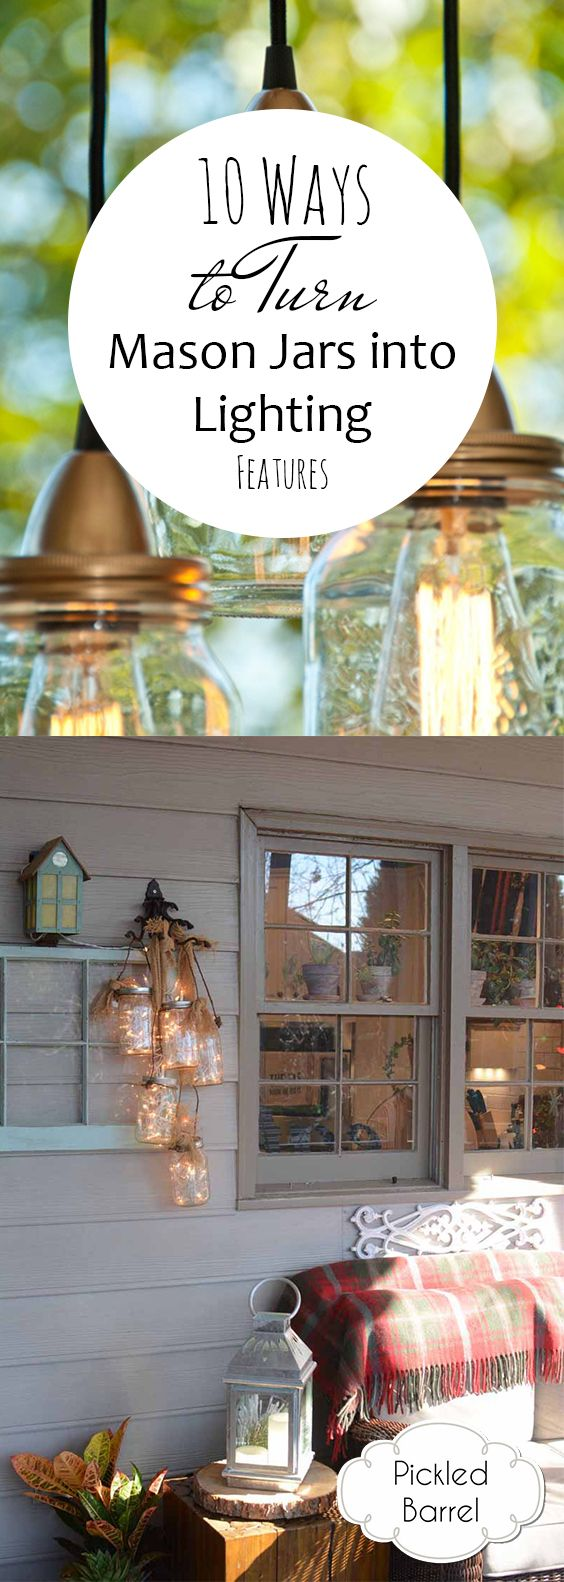 10 Ways to Turn Mason Jars into Lighting Features -